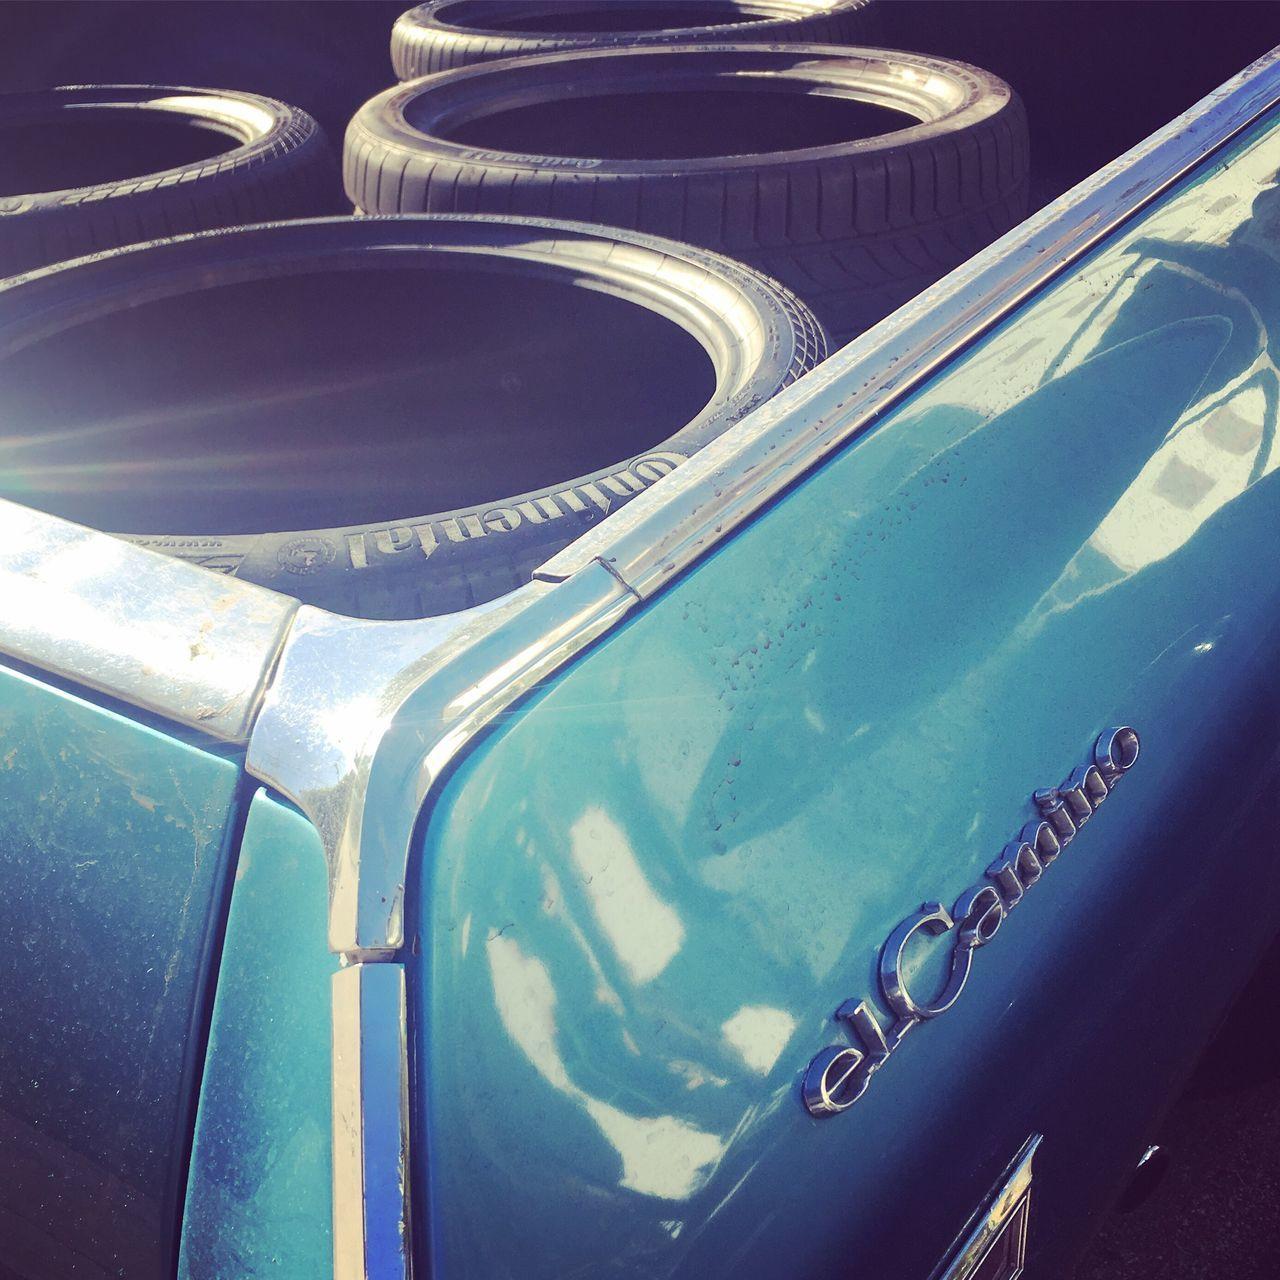 Hot Rod El Camino muscle car